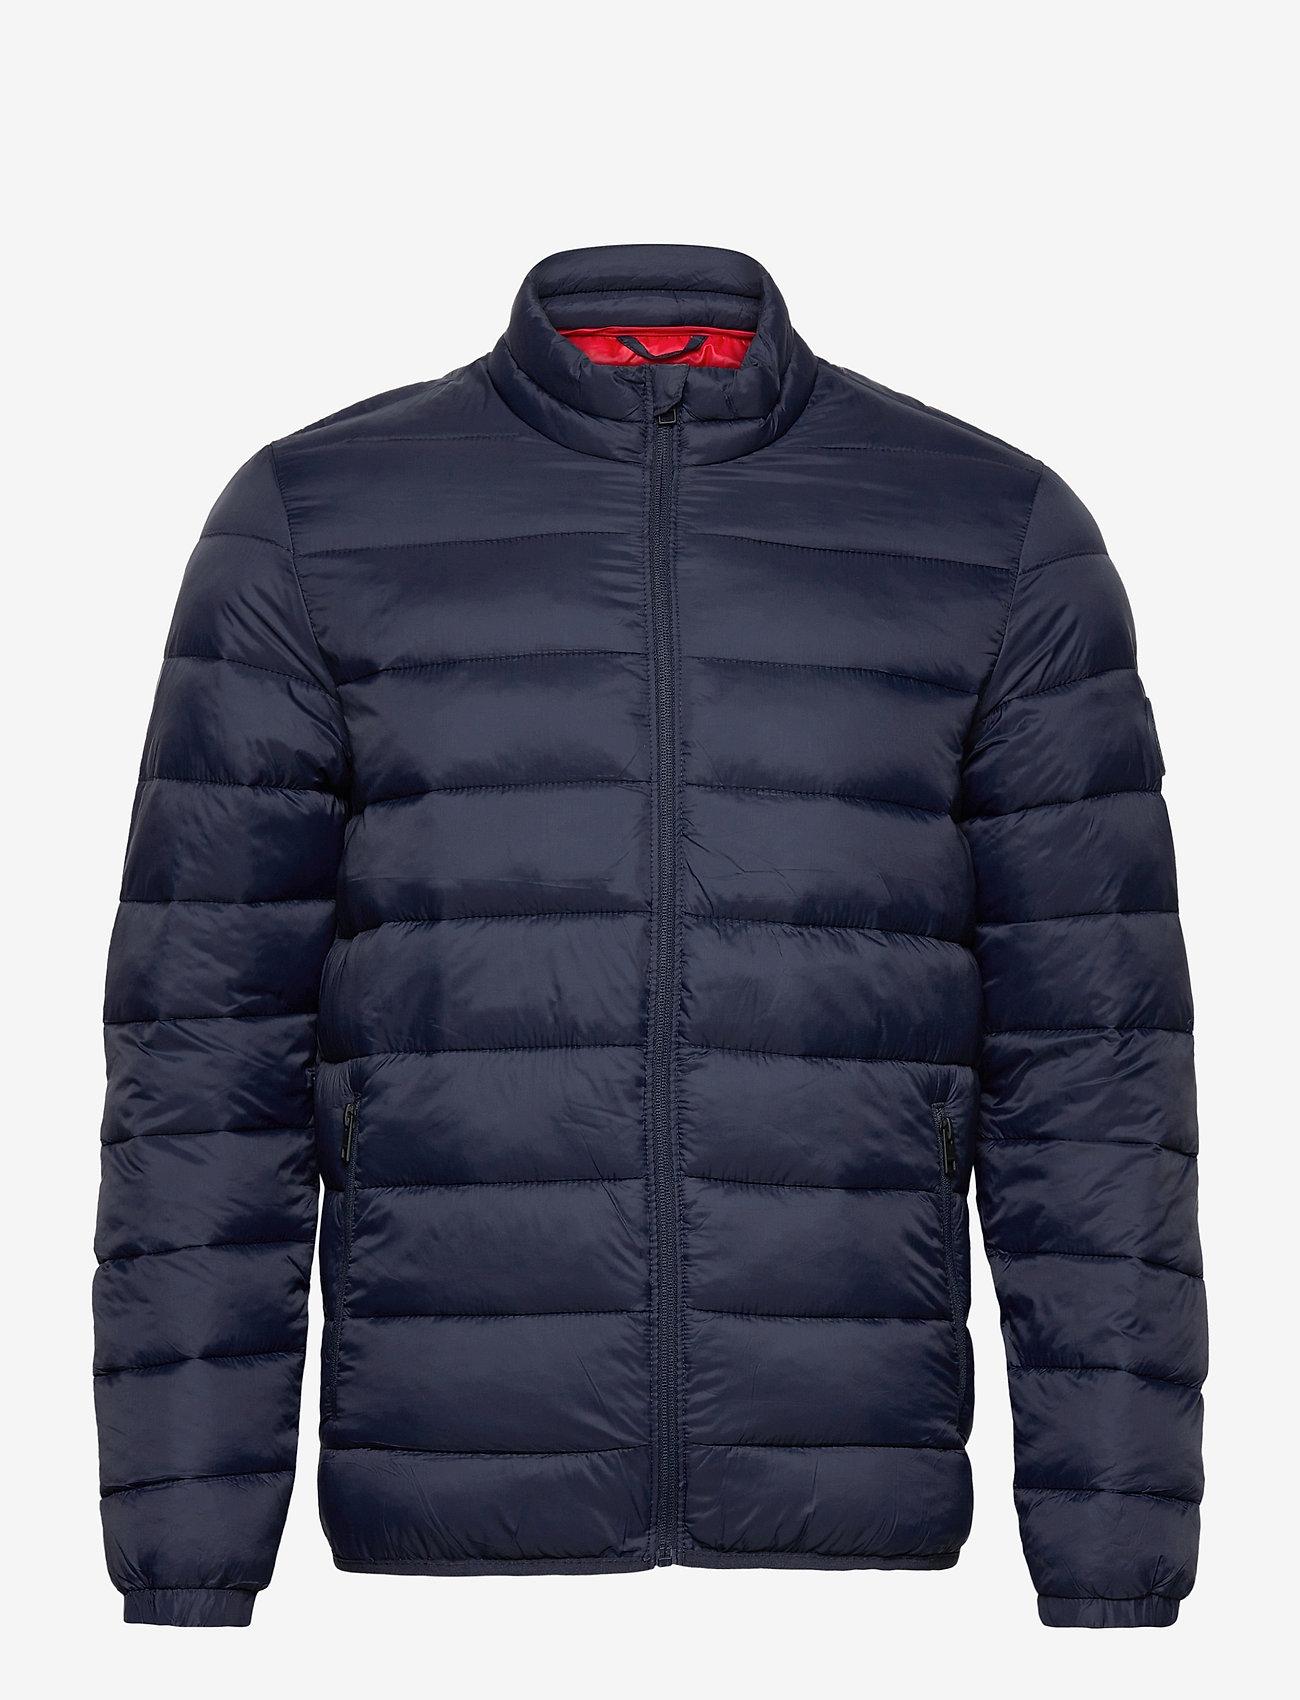 Jack & Jones - JJEMAGIC PUFFER COLLAR NOOS - vestes matelassées - navy blazer - 1